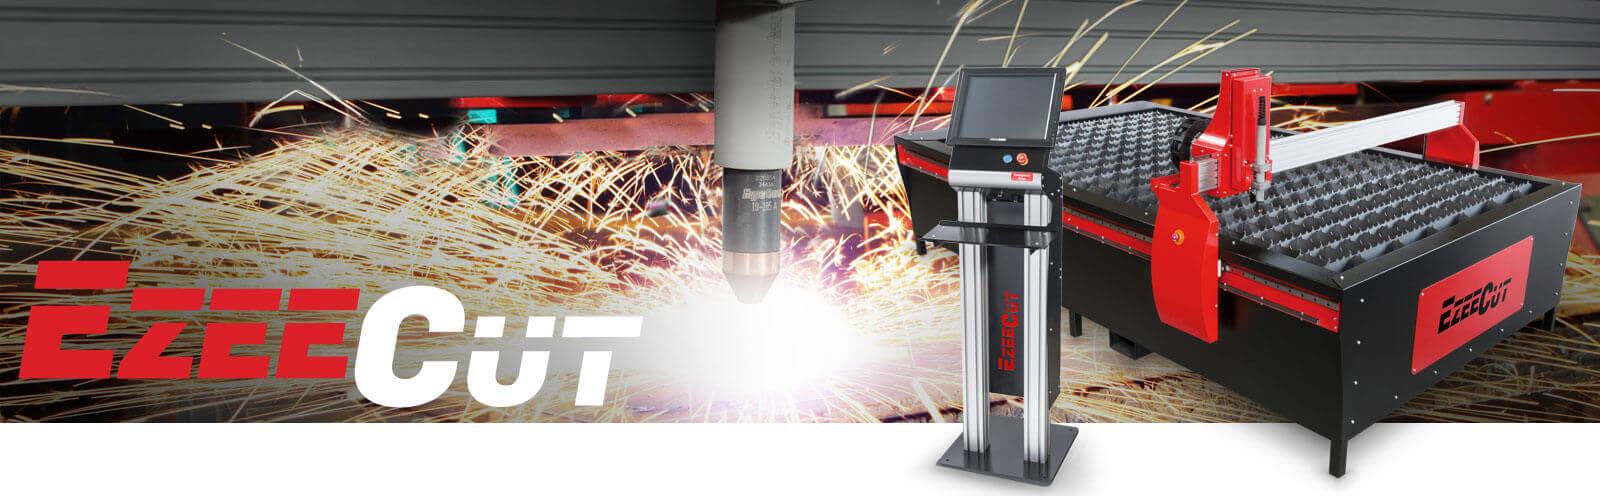 EzeeCut CNC Plasma Cutter